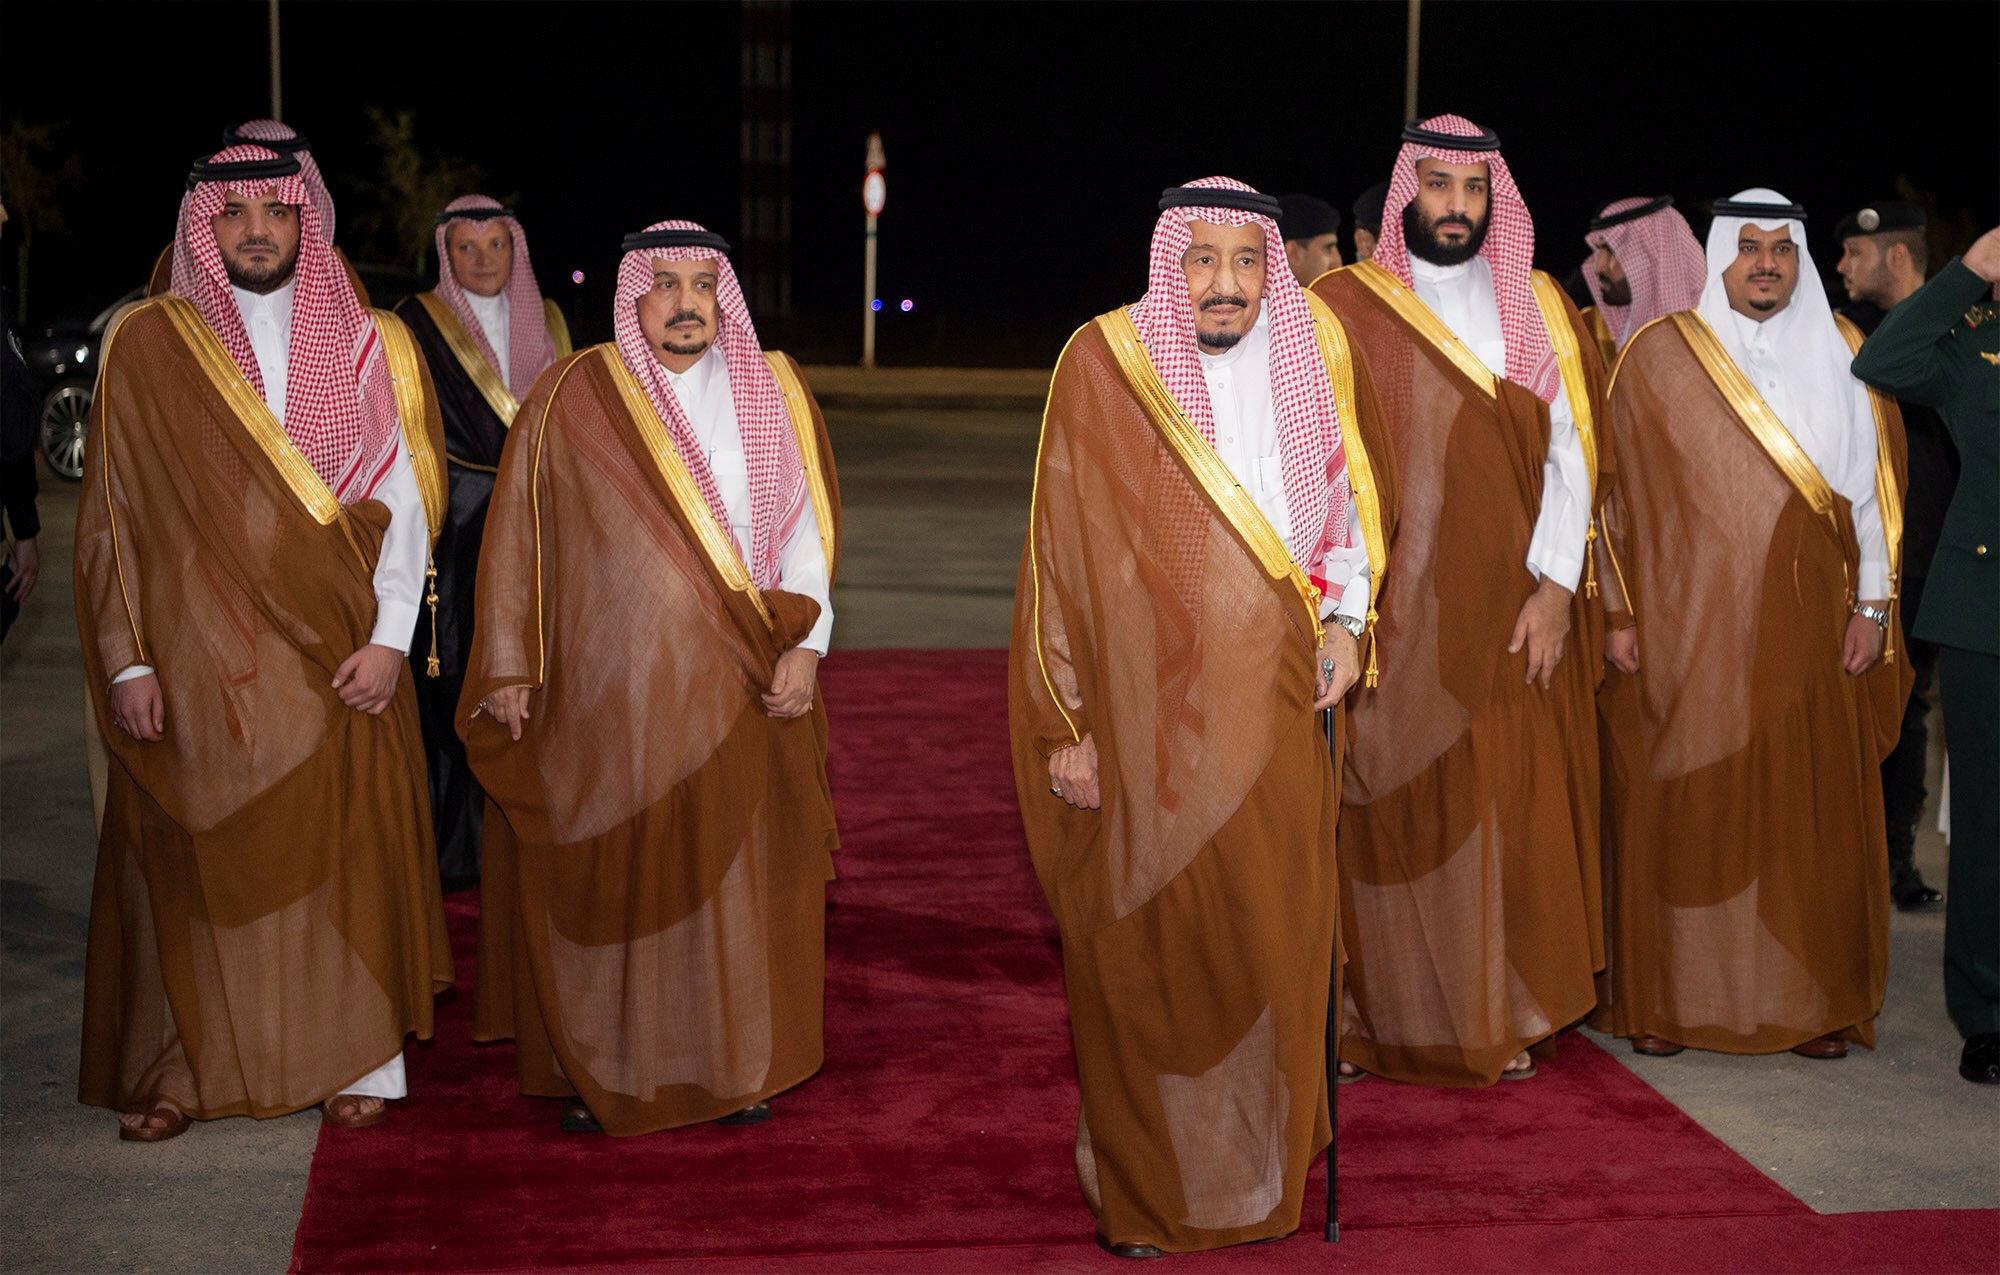 El rey de Arabia Saudita, Salman bin Abdulaziz Al Saud, junto al príncipe, Mohammed bin Salman